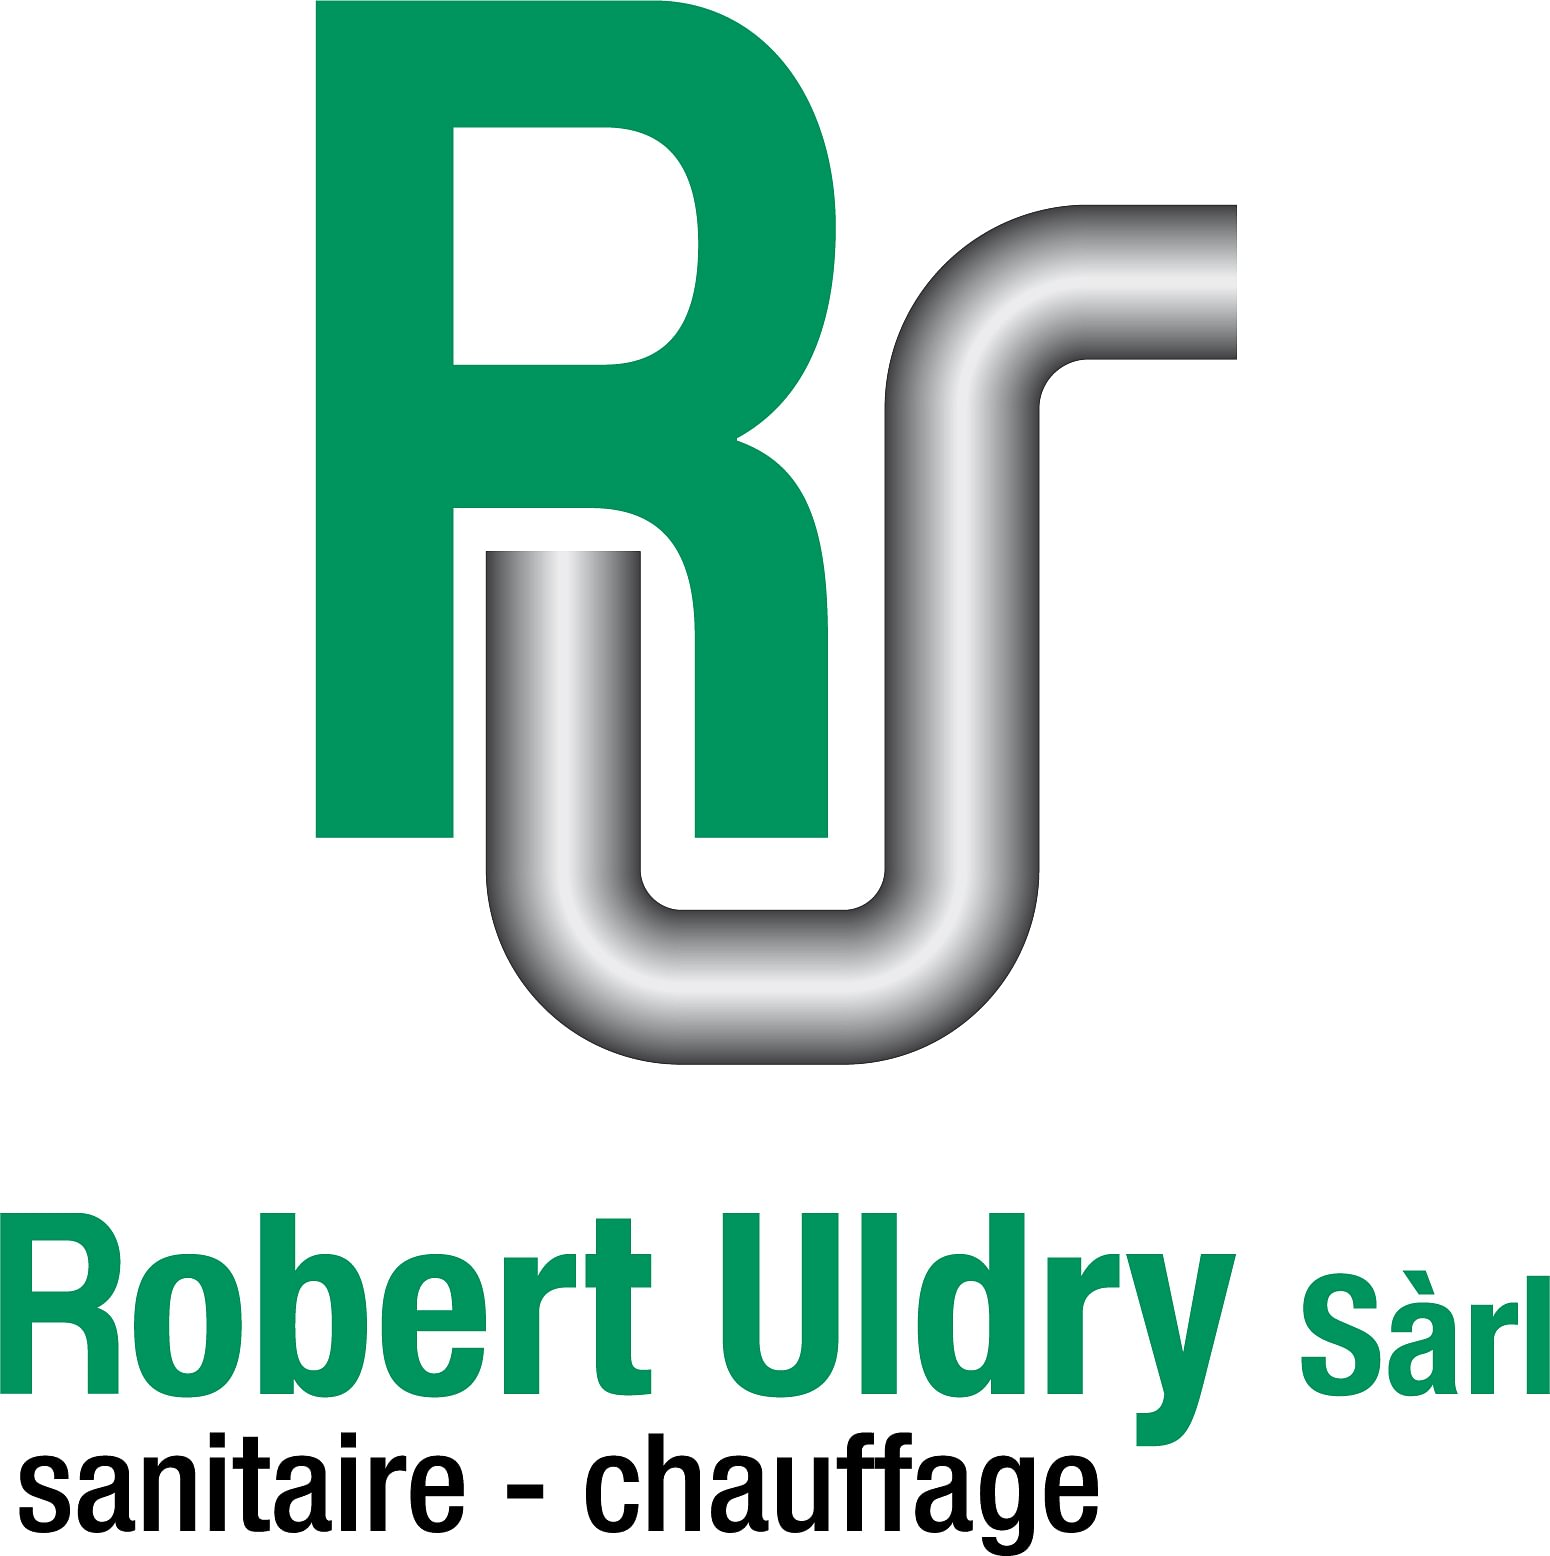 Robert Uldry Sàrl, Sanitaire & chauffage